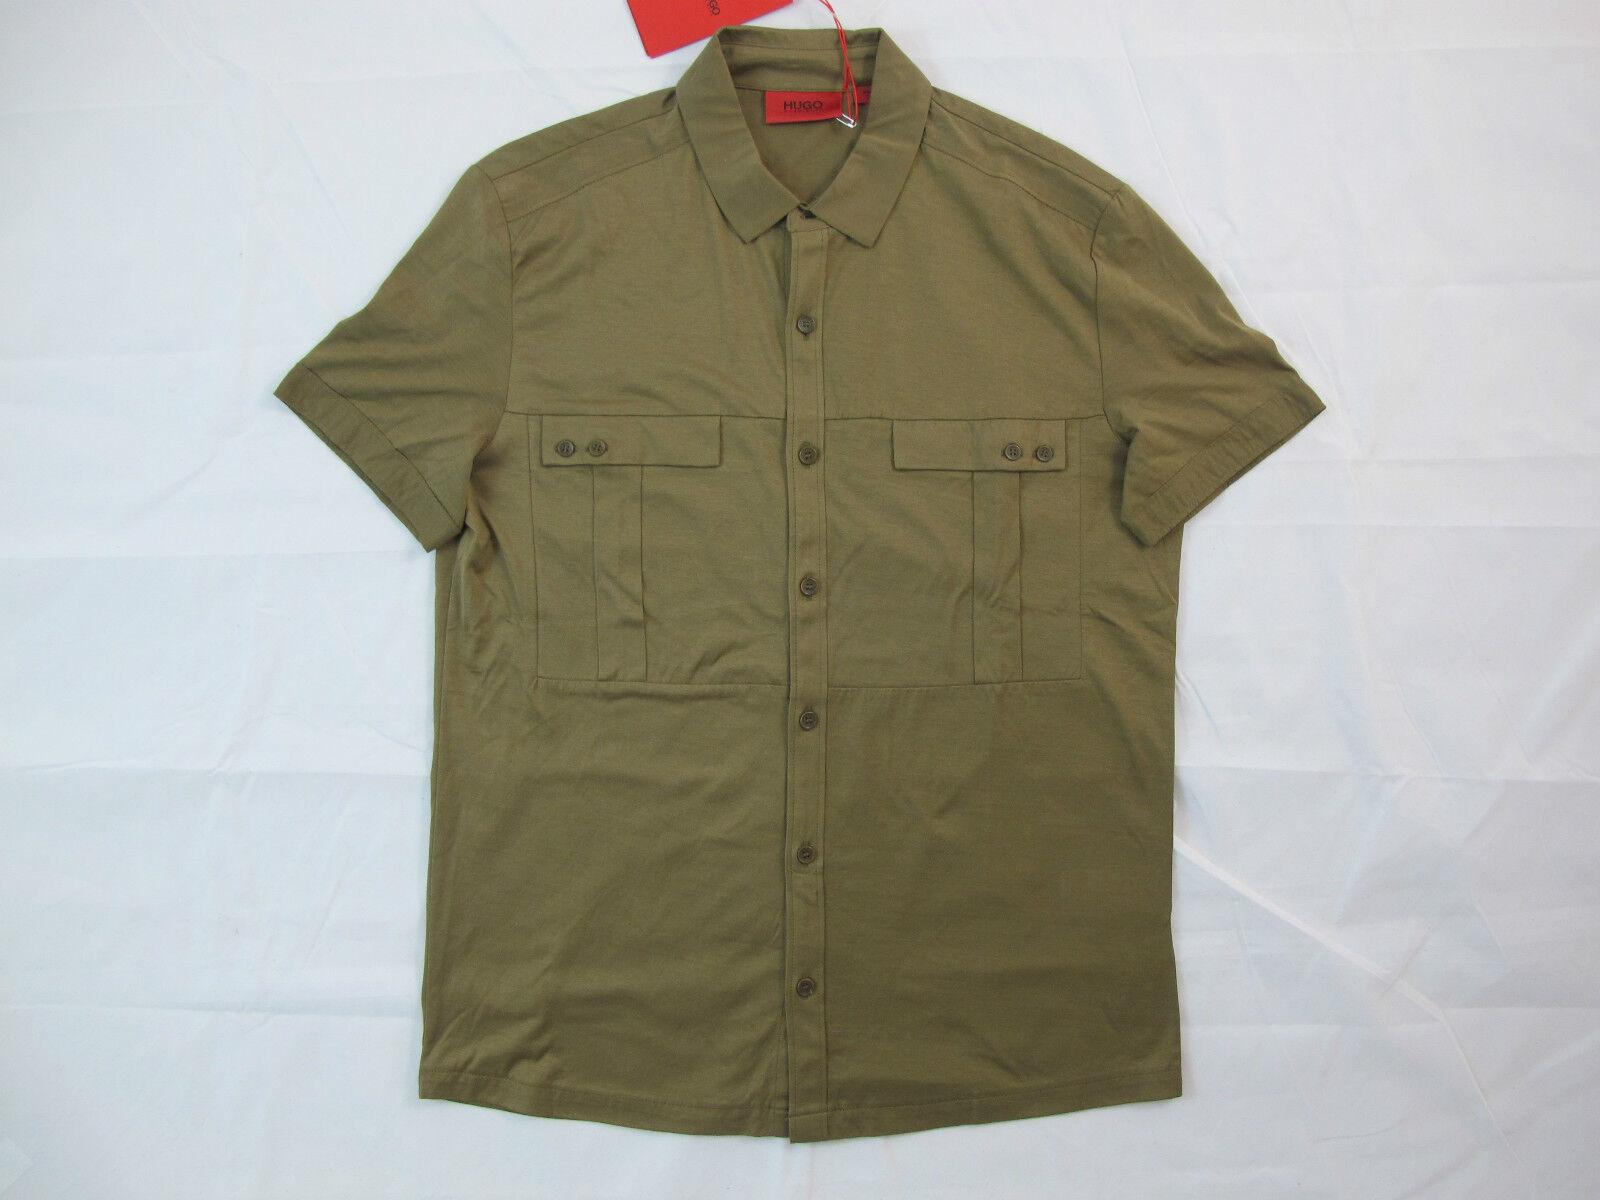 Hugo Boss ROT Tag Braun Classic Button Down Shirt Sz. S BNWT 100% Authentic